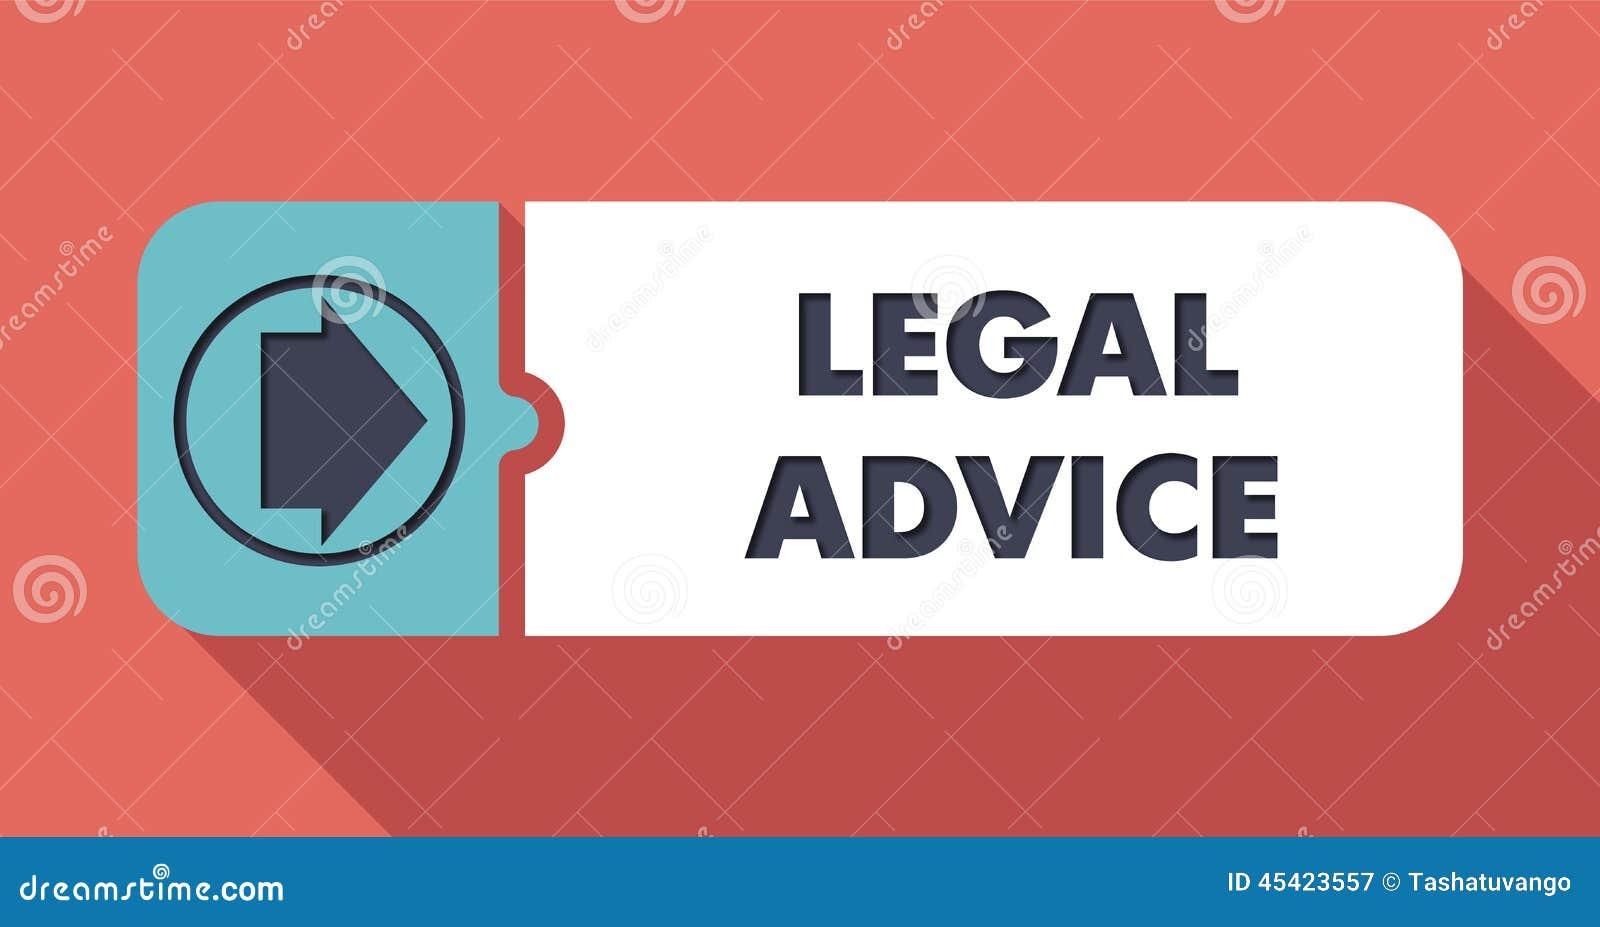 Legal Advice On Scarlet In Flat Design. Stock Illustration ...